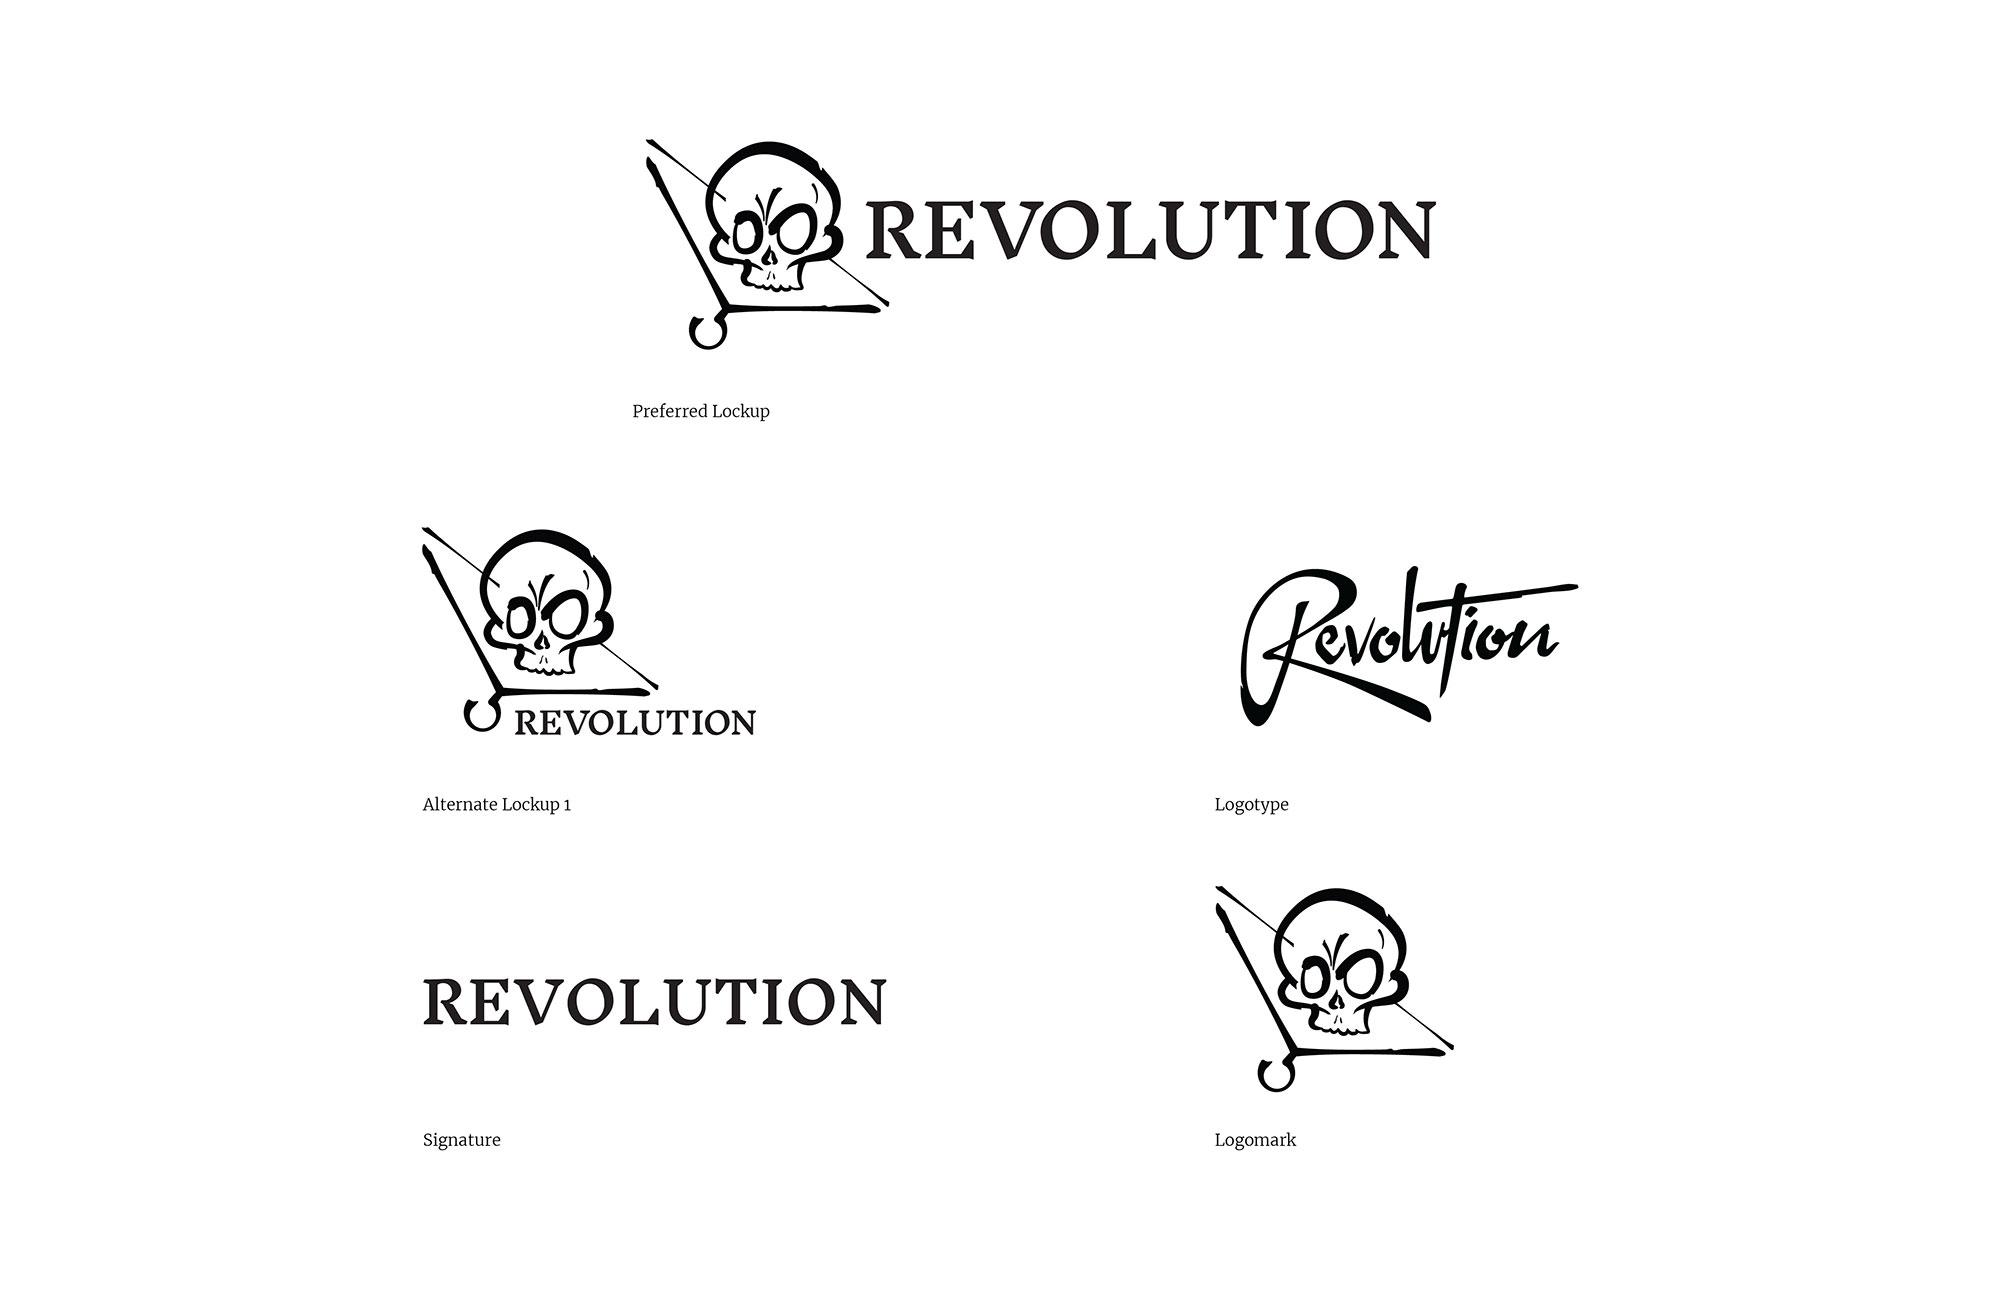 Revolution_Concepts2-2